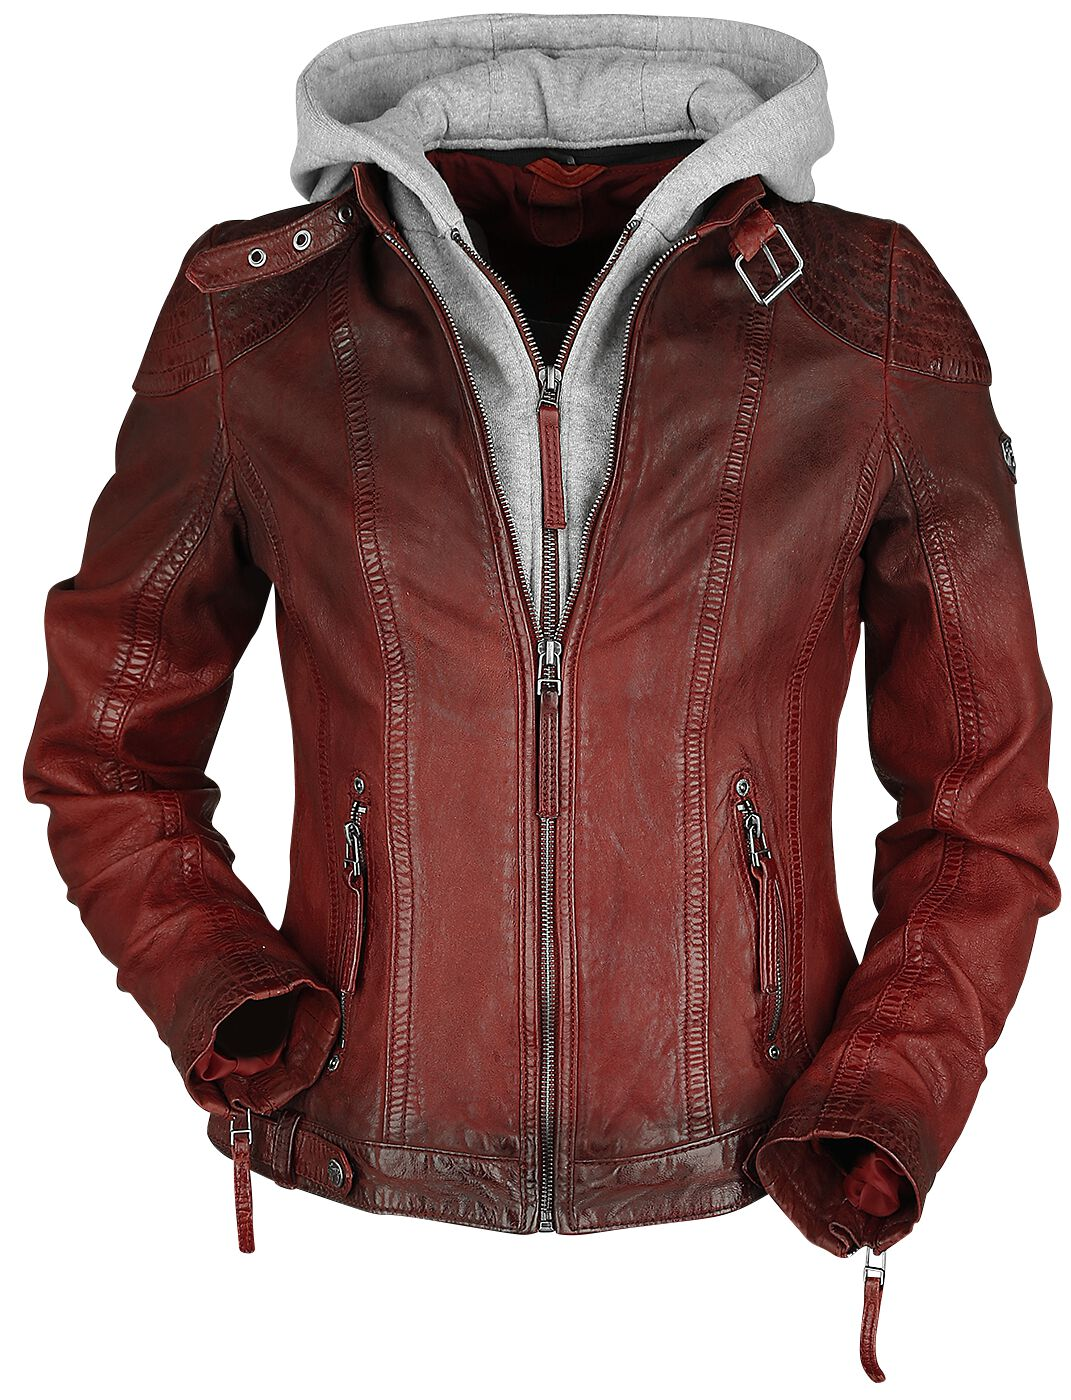 Jacken für Frauen - Gipsy Cascha LAMOV Lederjacke rot  - Onlineshop EMP